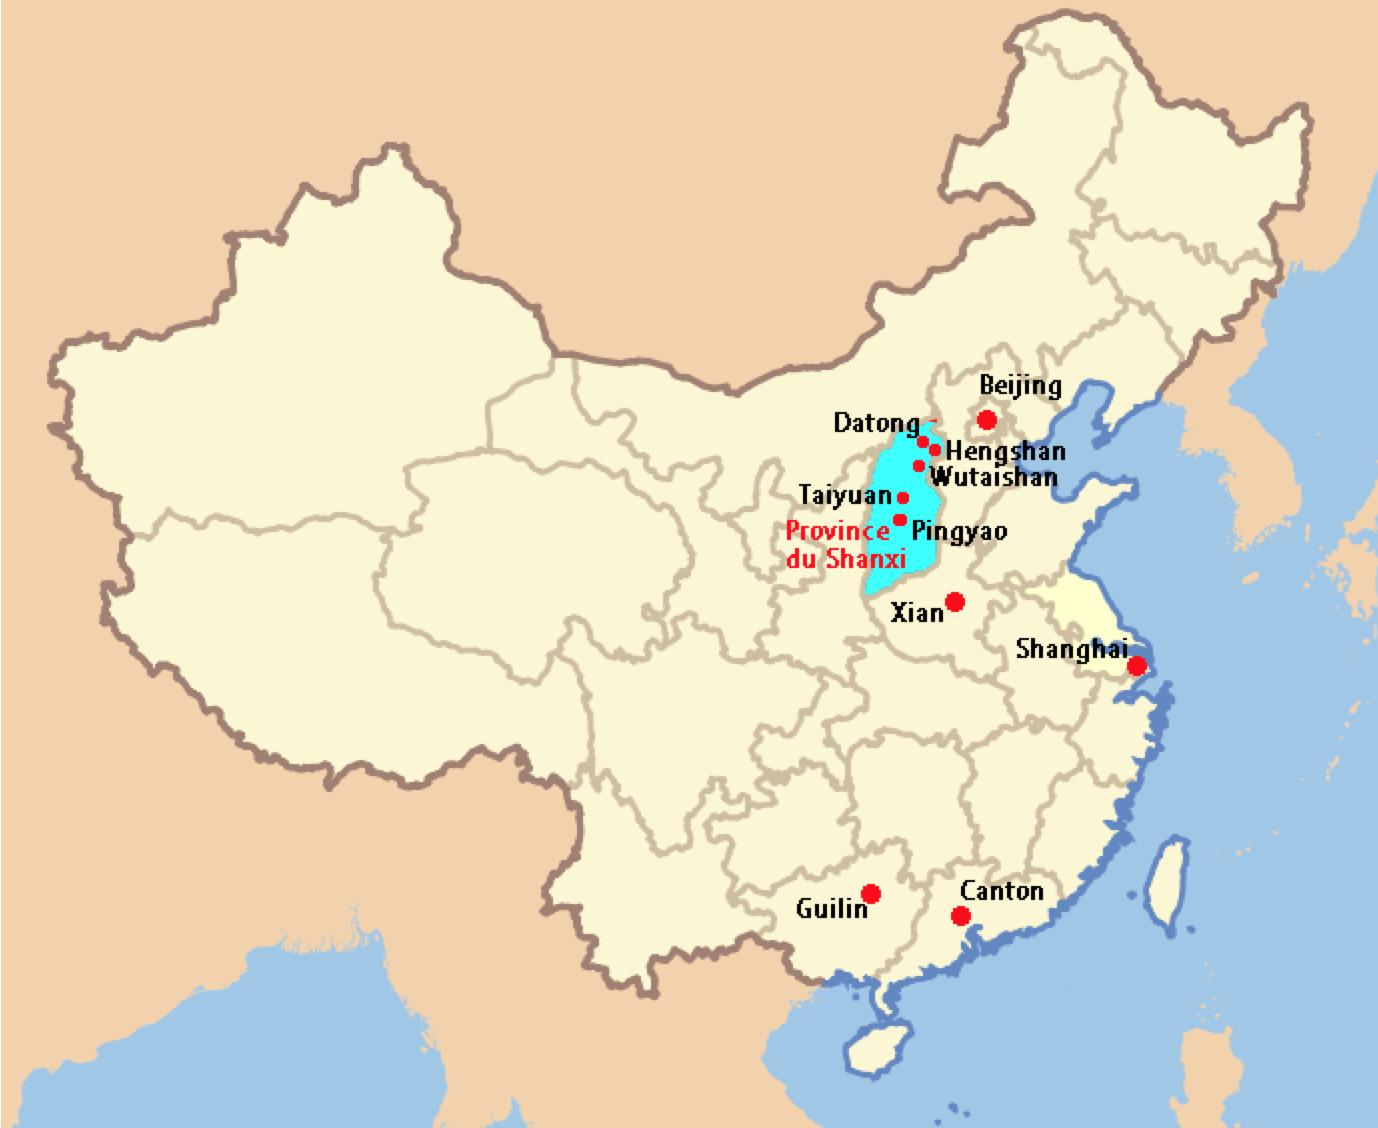 Image source: www.chinevoyage.com